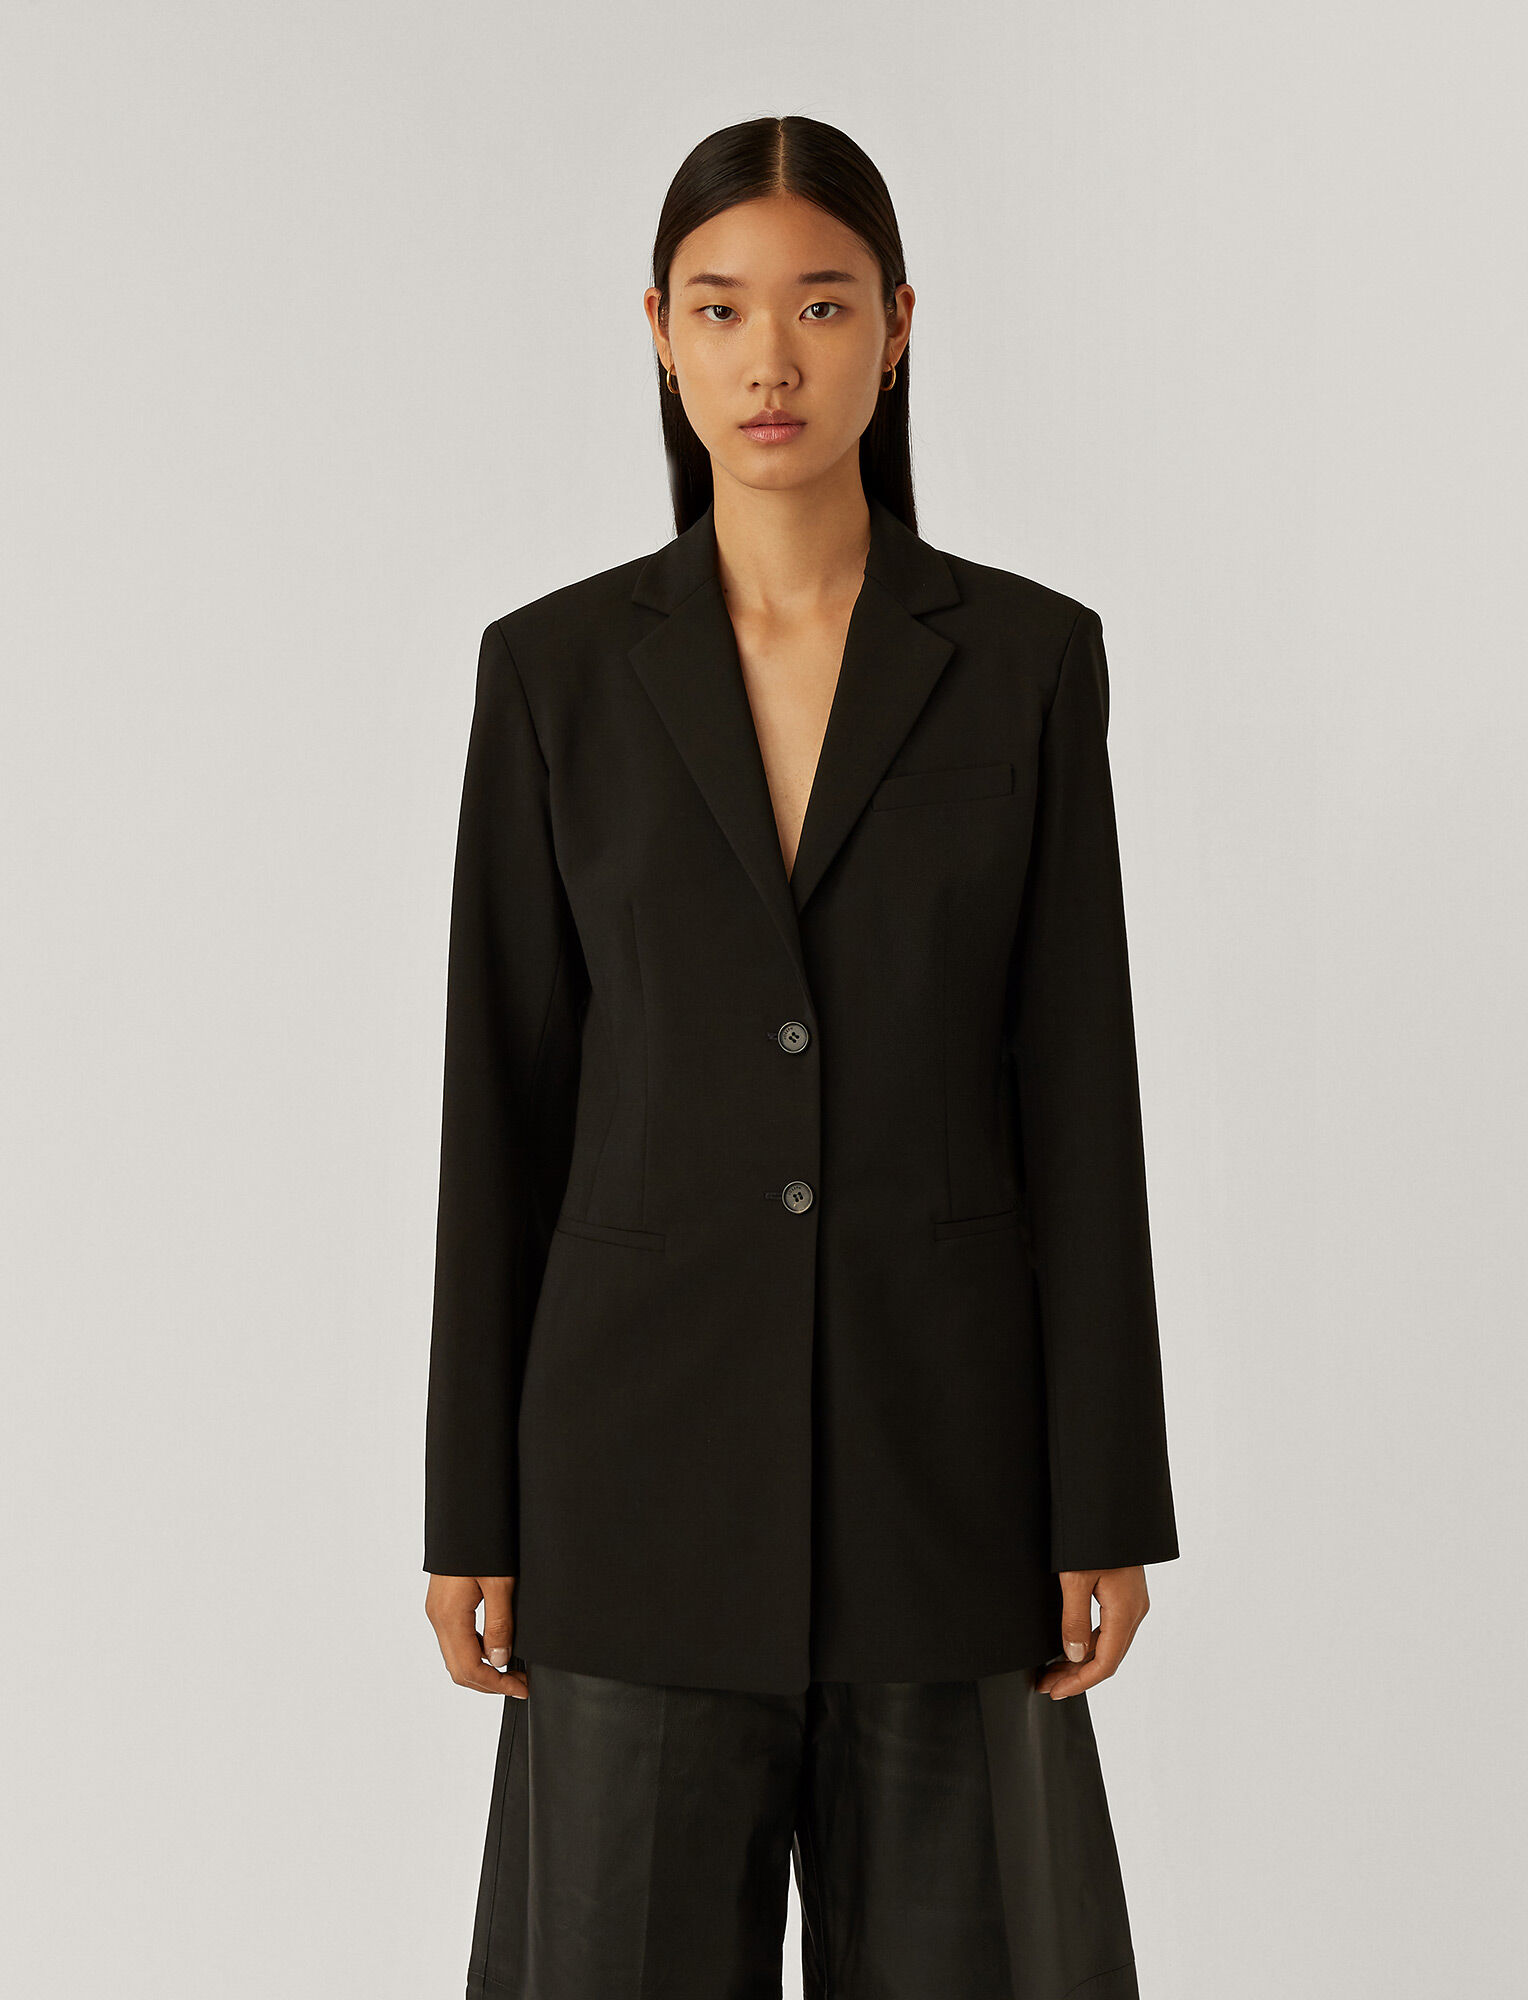 Joseph, Jani Light Wool Suiting Jacket, in Black